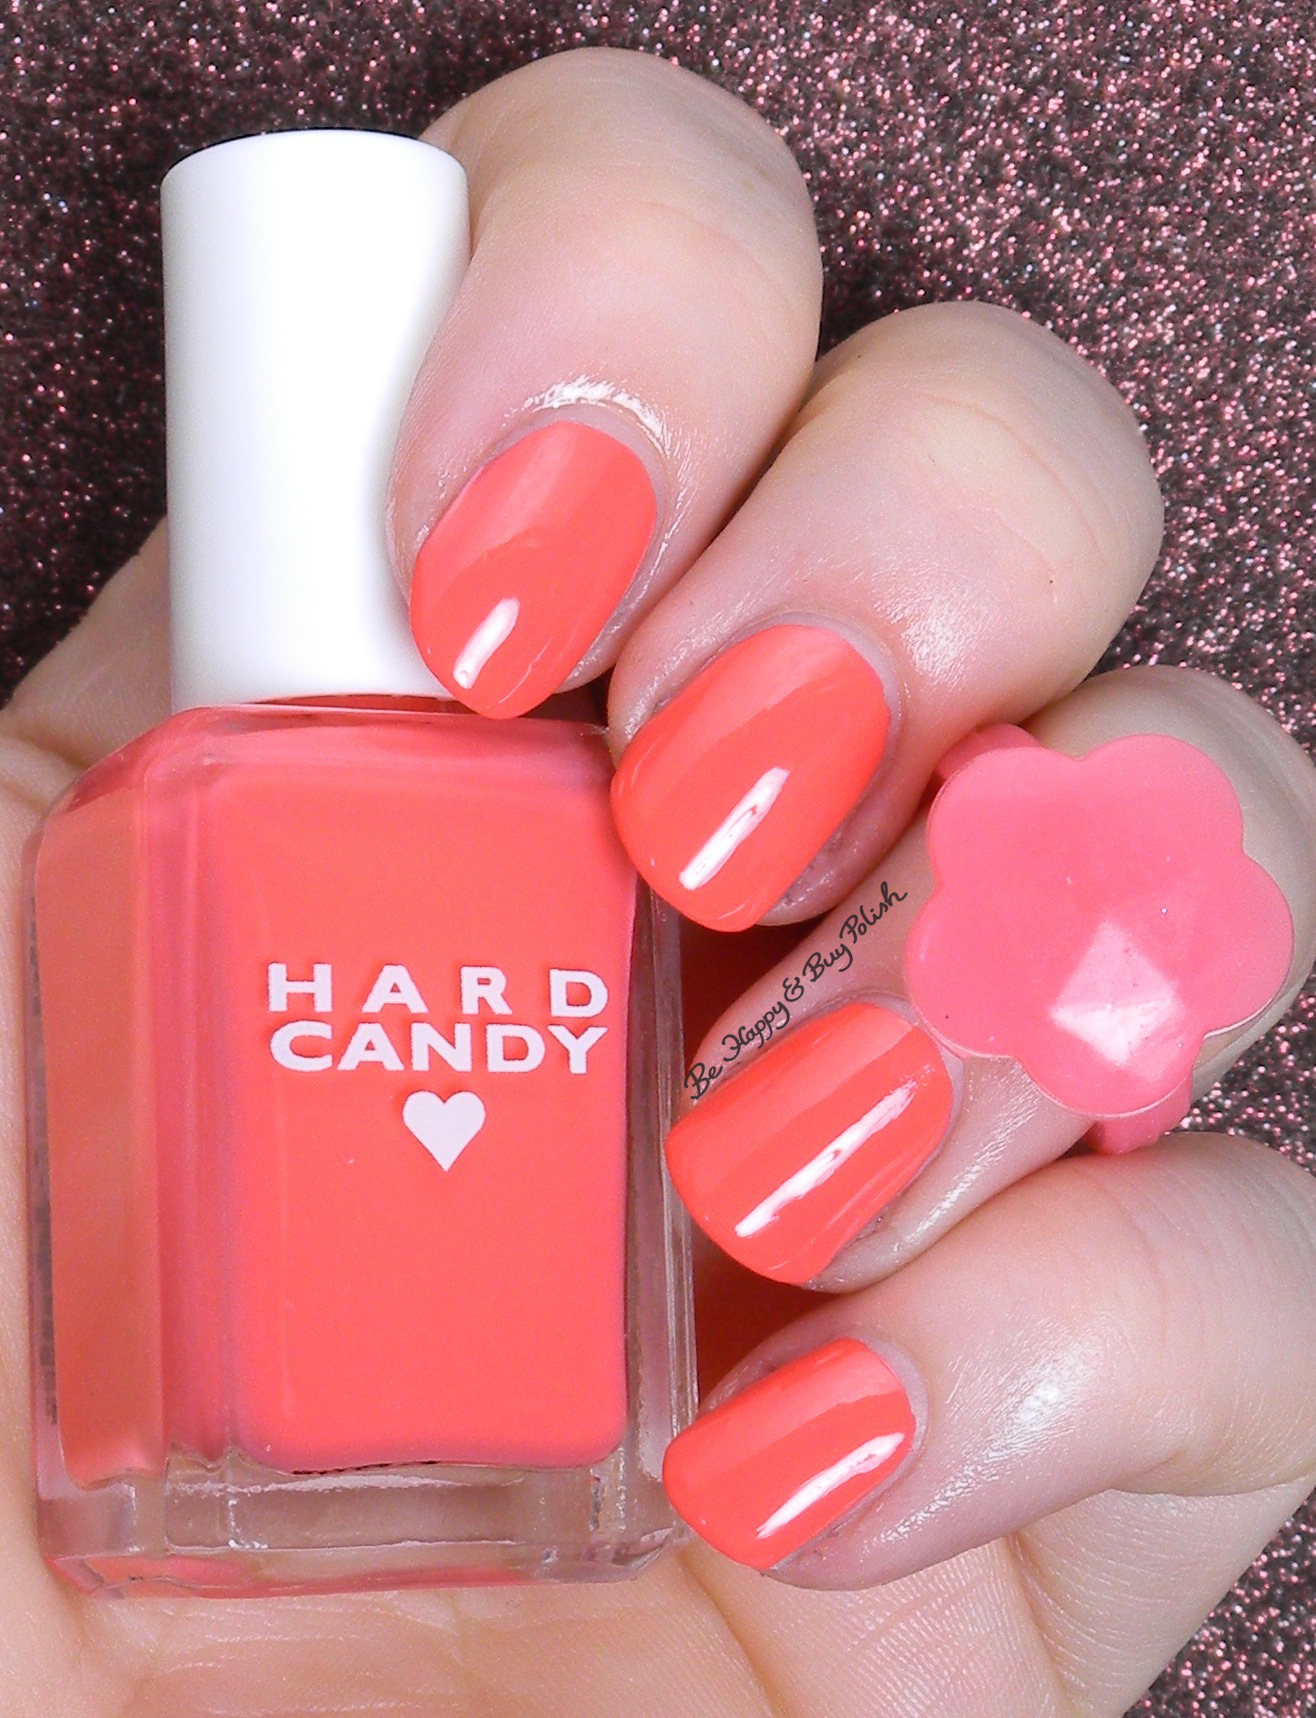 Hard Candy Tangerini And Zombie 20th Anniversary Nail Polishes Be Happy And Buy Polish